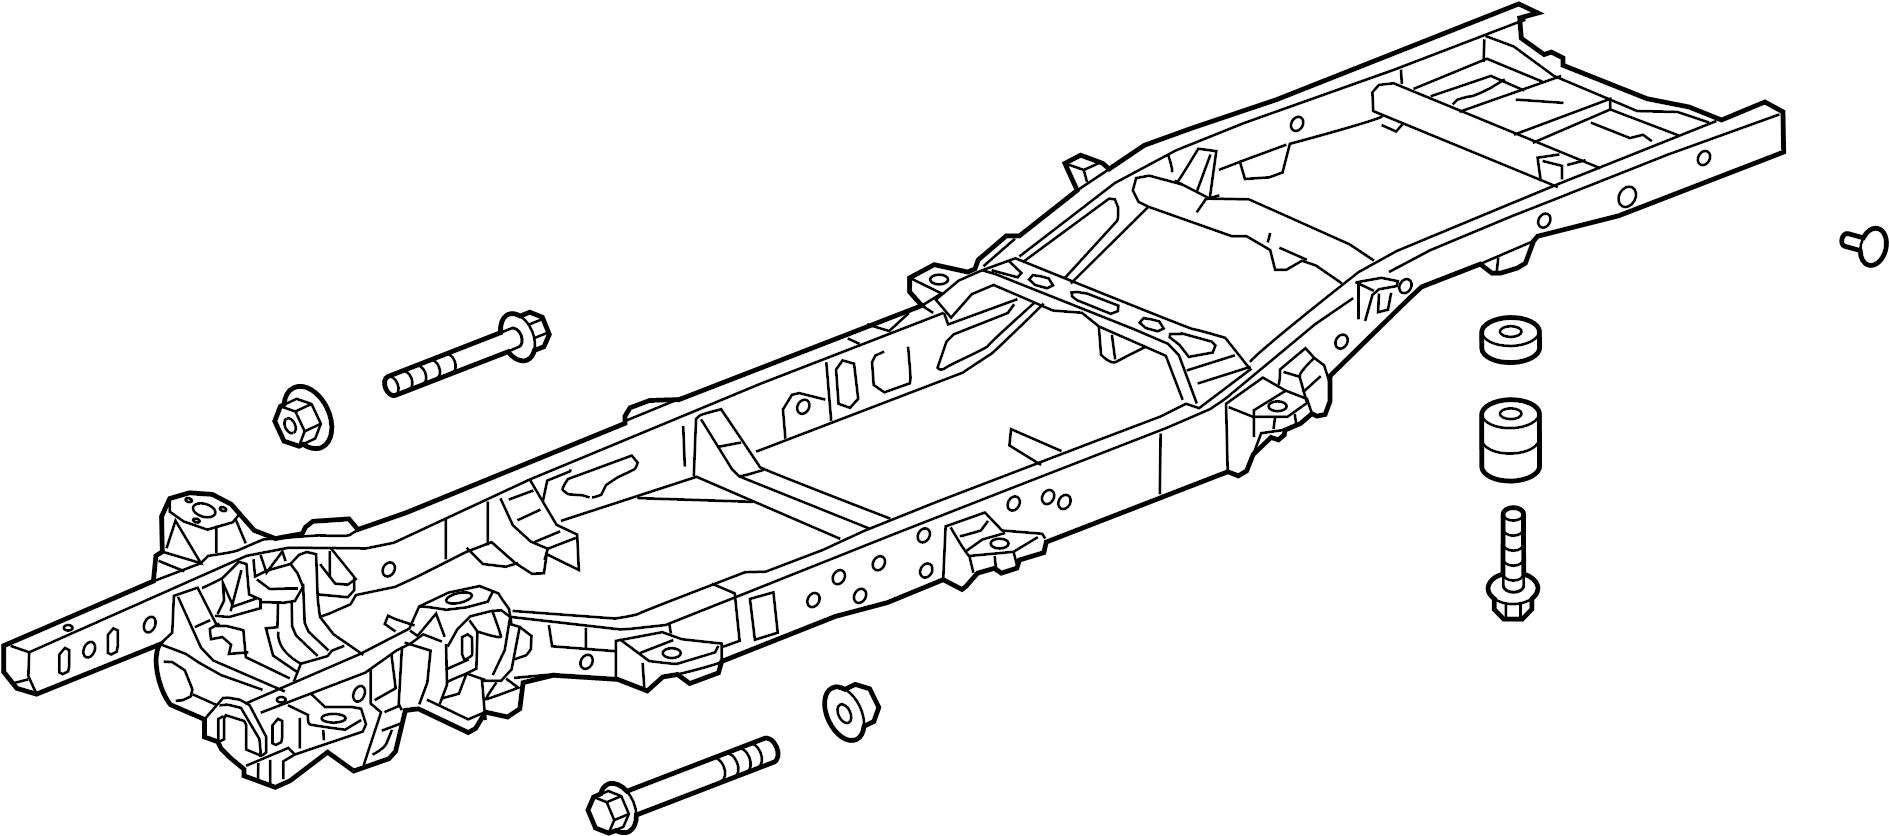 Gmc Sierra 1500 Frame Rail  2wd  Regular Cab  6 6 Ft Box  4wd  Regular Cab  6 6 Ft Box